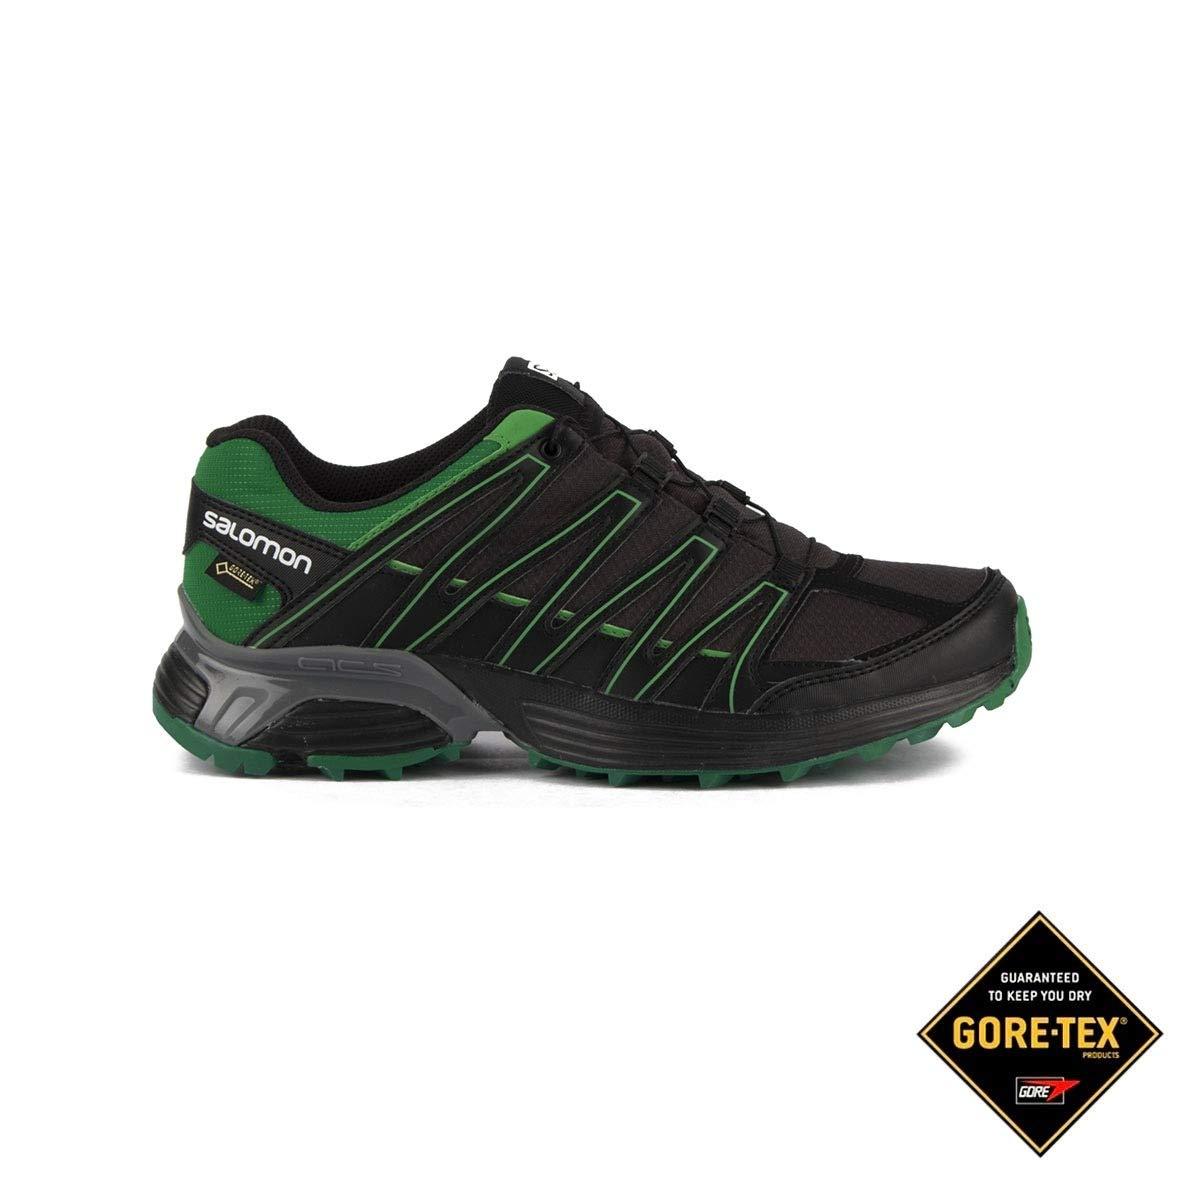 Salomon Zapatilla XT Asama GTX Phantom Fern Green Negro Verde Hombre - 43 1/3, Hombre: Amazon.es: Zapatos y complementos